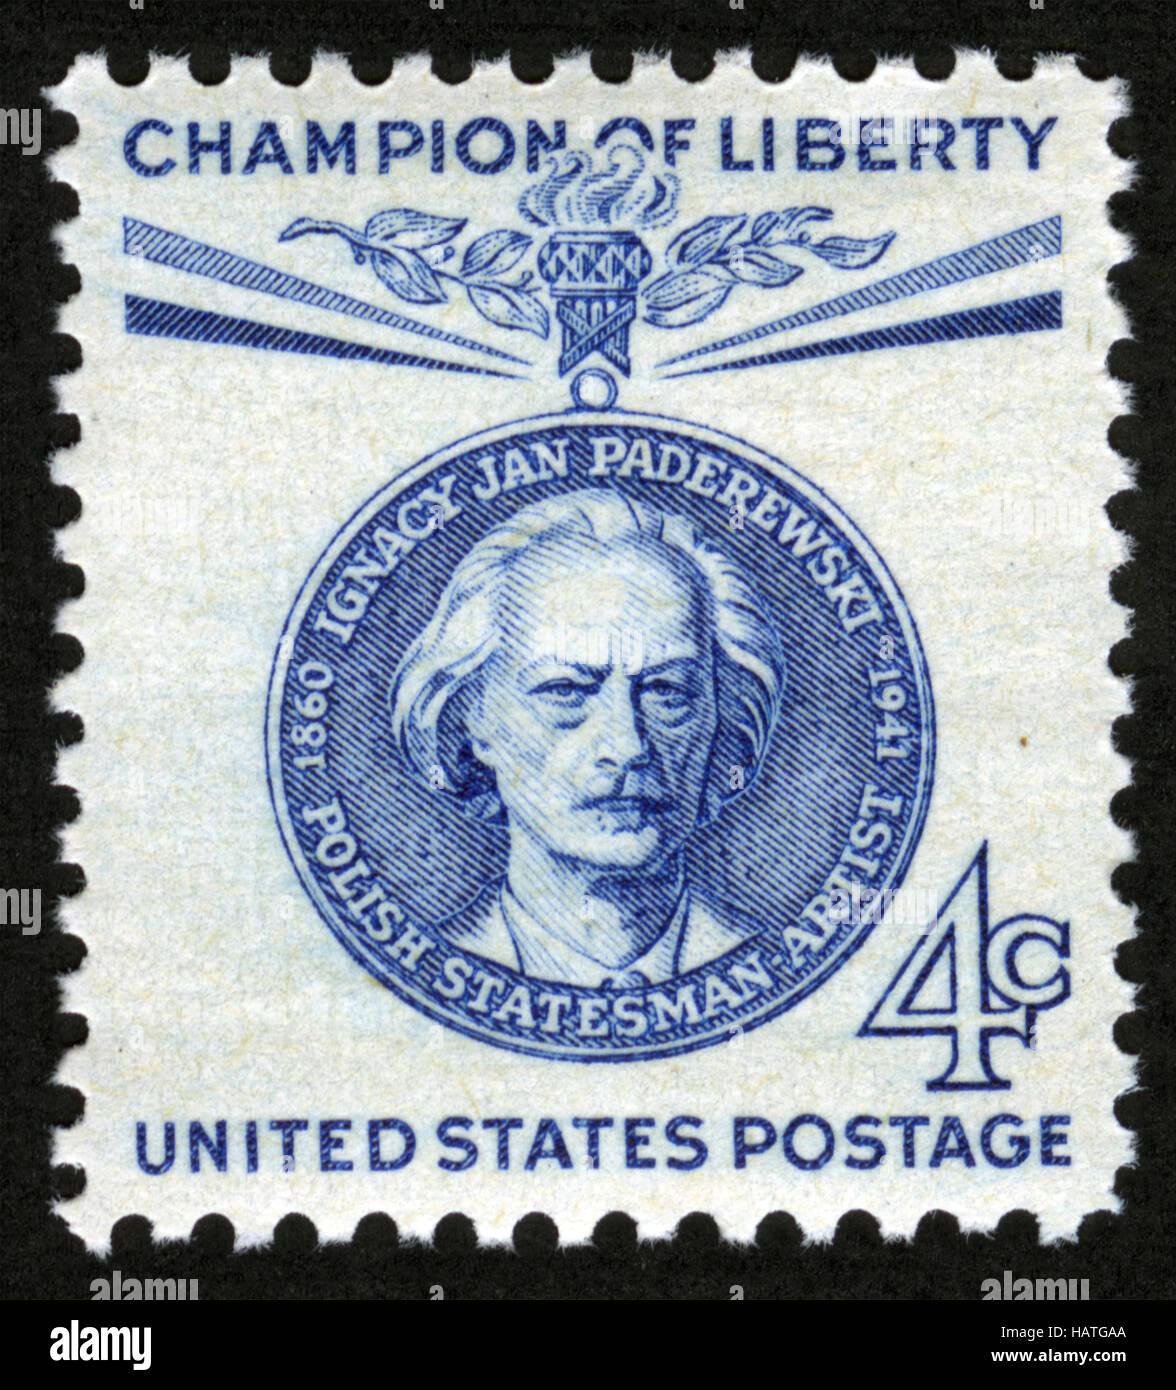 UScirca 1960 Postage Stamp Champion Liberty Ignacy Jan Paderewski Polish Statesman